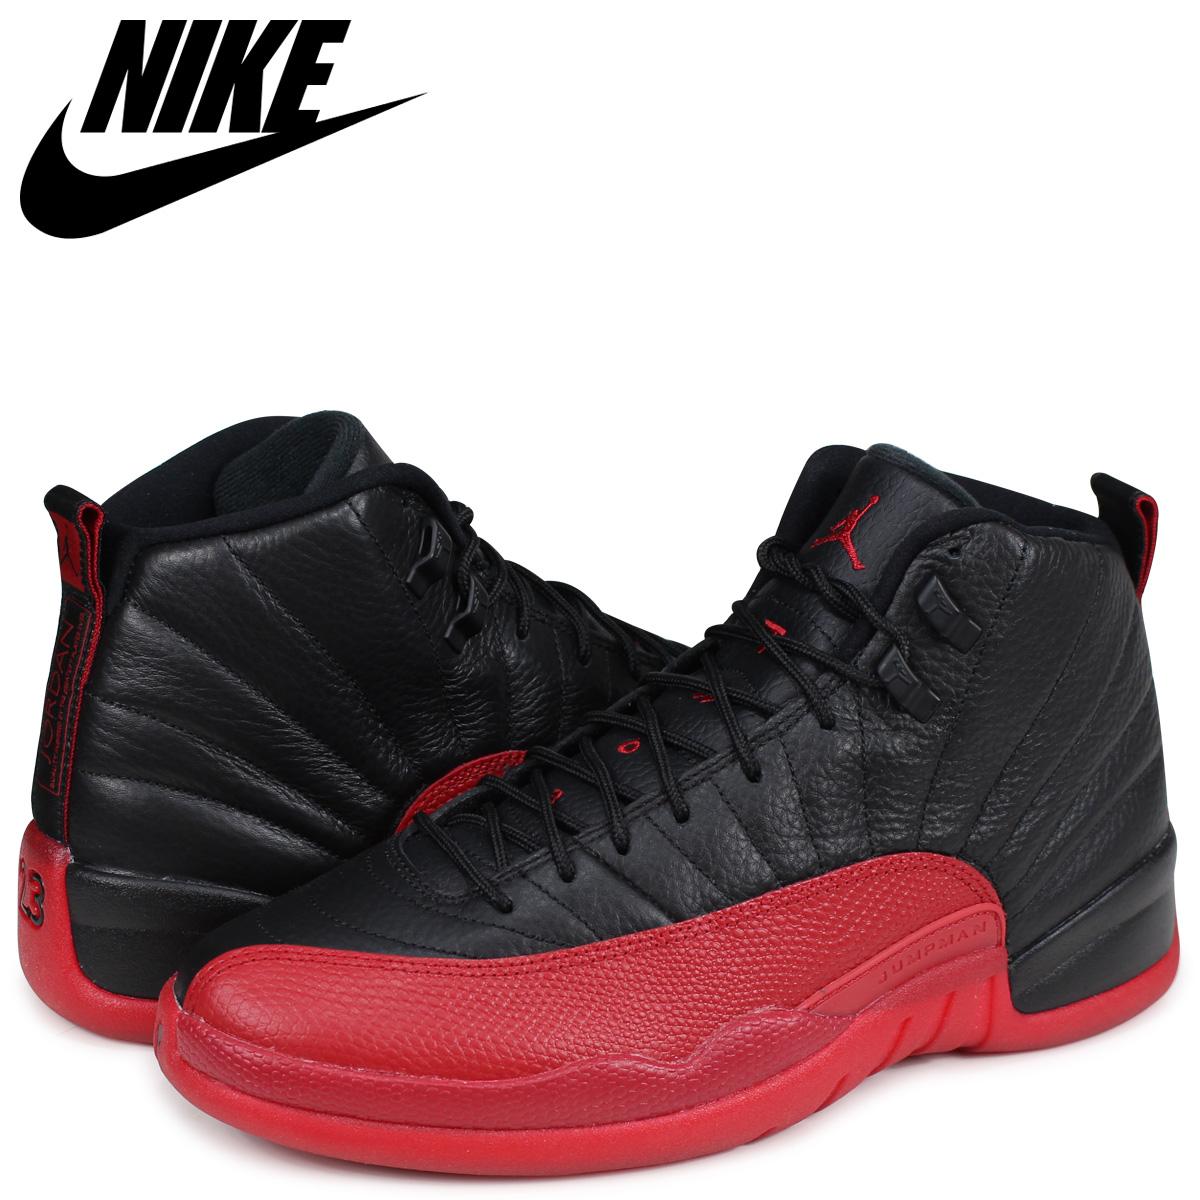 d2d4b2a2493a84 ... aliexpress nike air jordan 12 retro flu game nike air jordan 12  nostalgic sneakers mens full